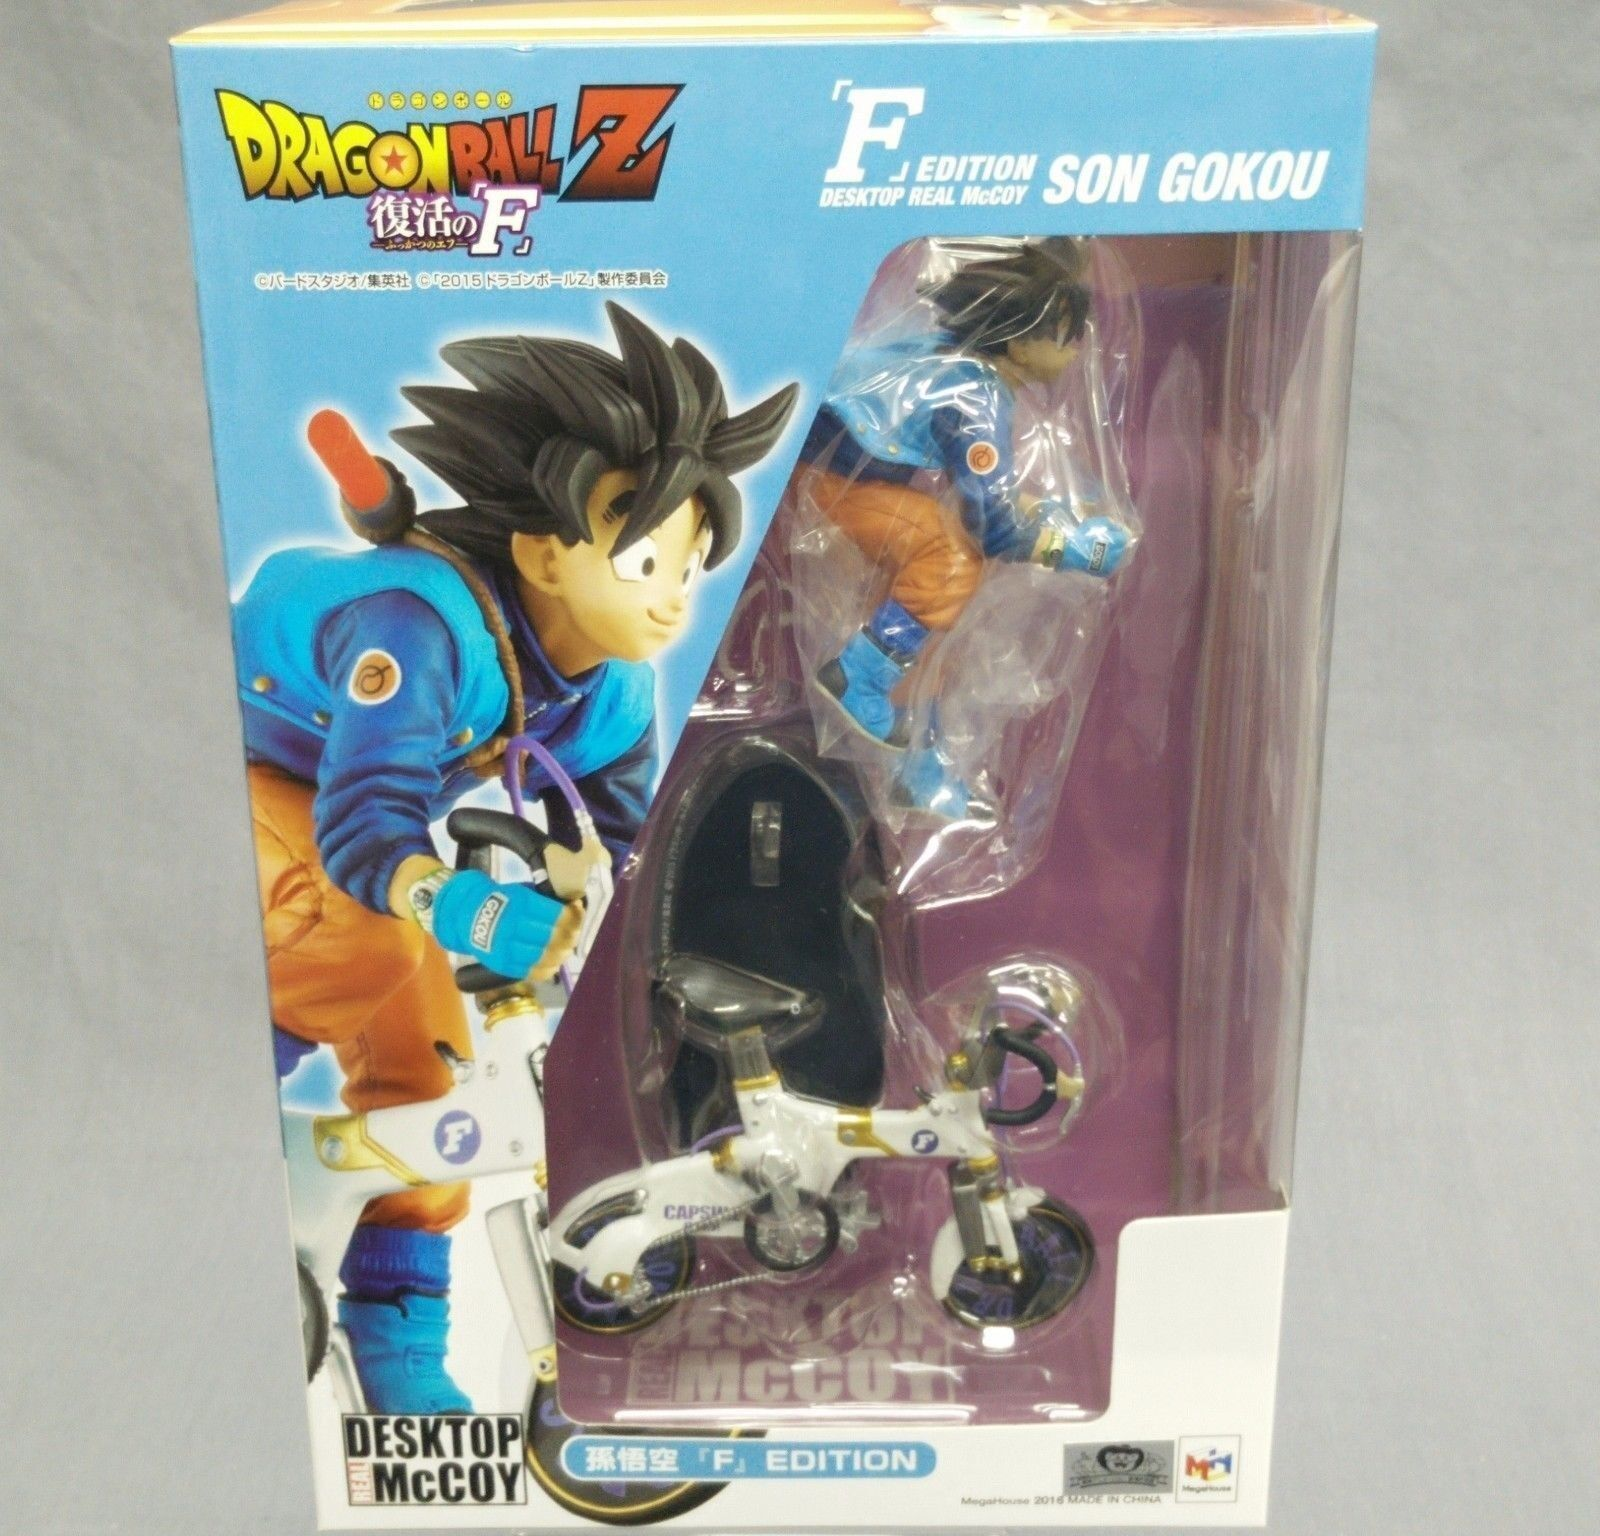 DESKTOP REAL McCOY Dragon Btutti Z Son  Goku 02 F edizione Megahouse Japan nuovo  best-seller